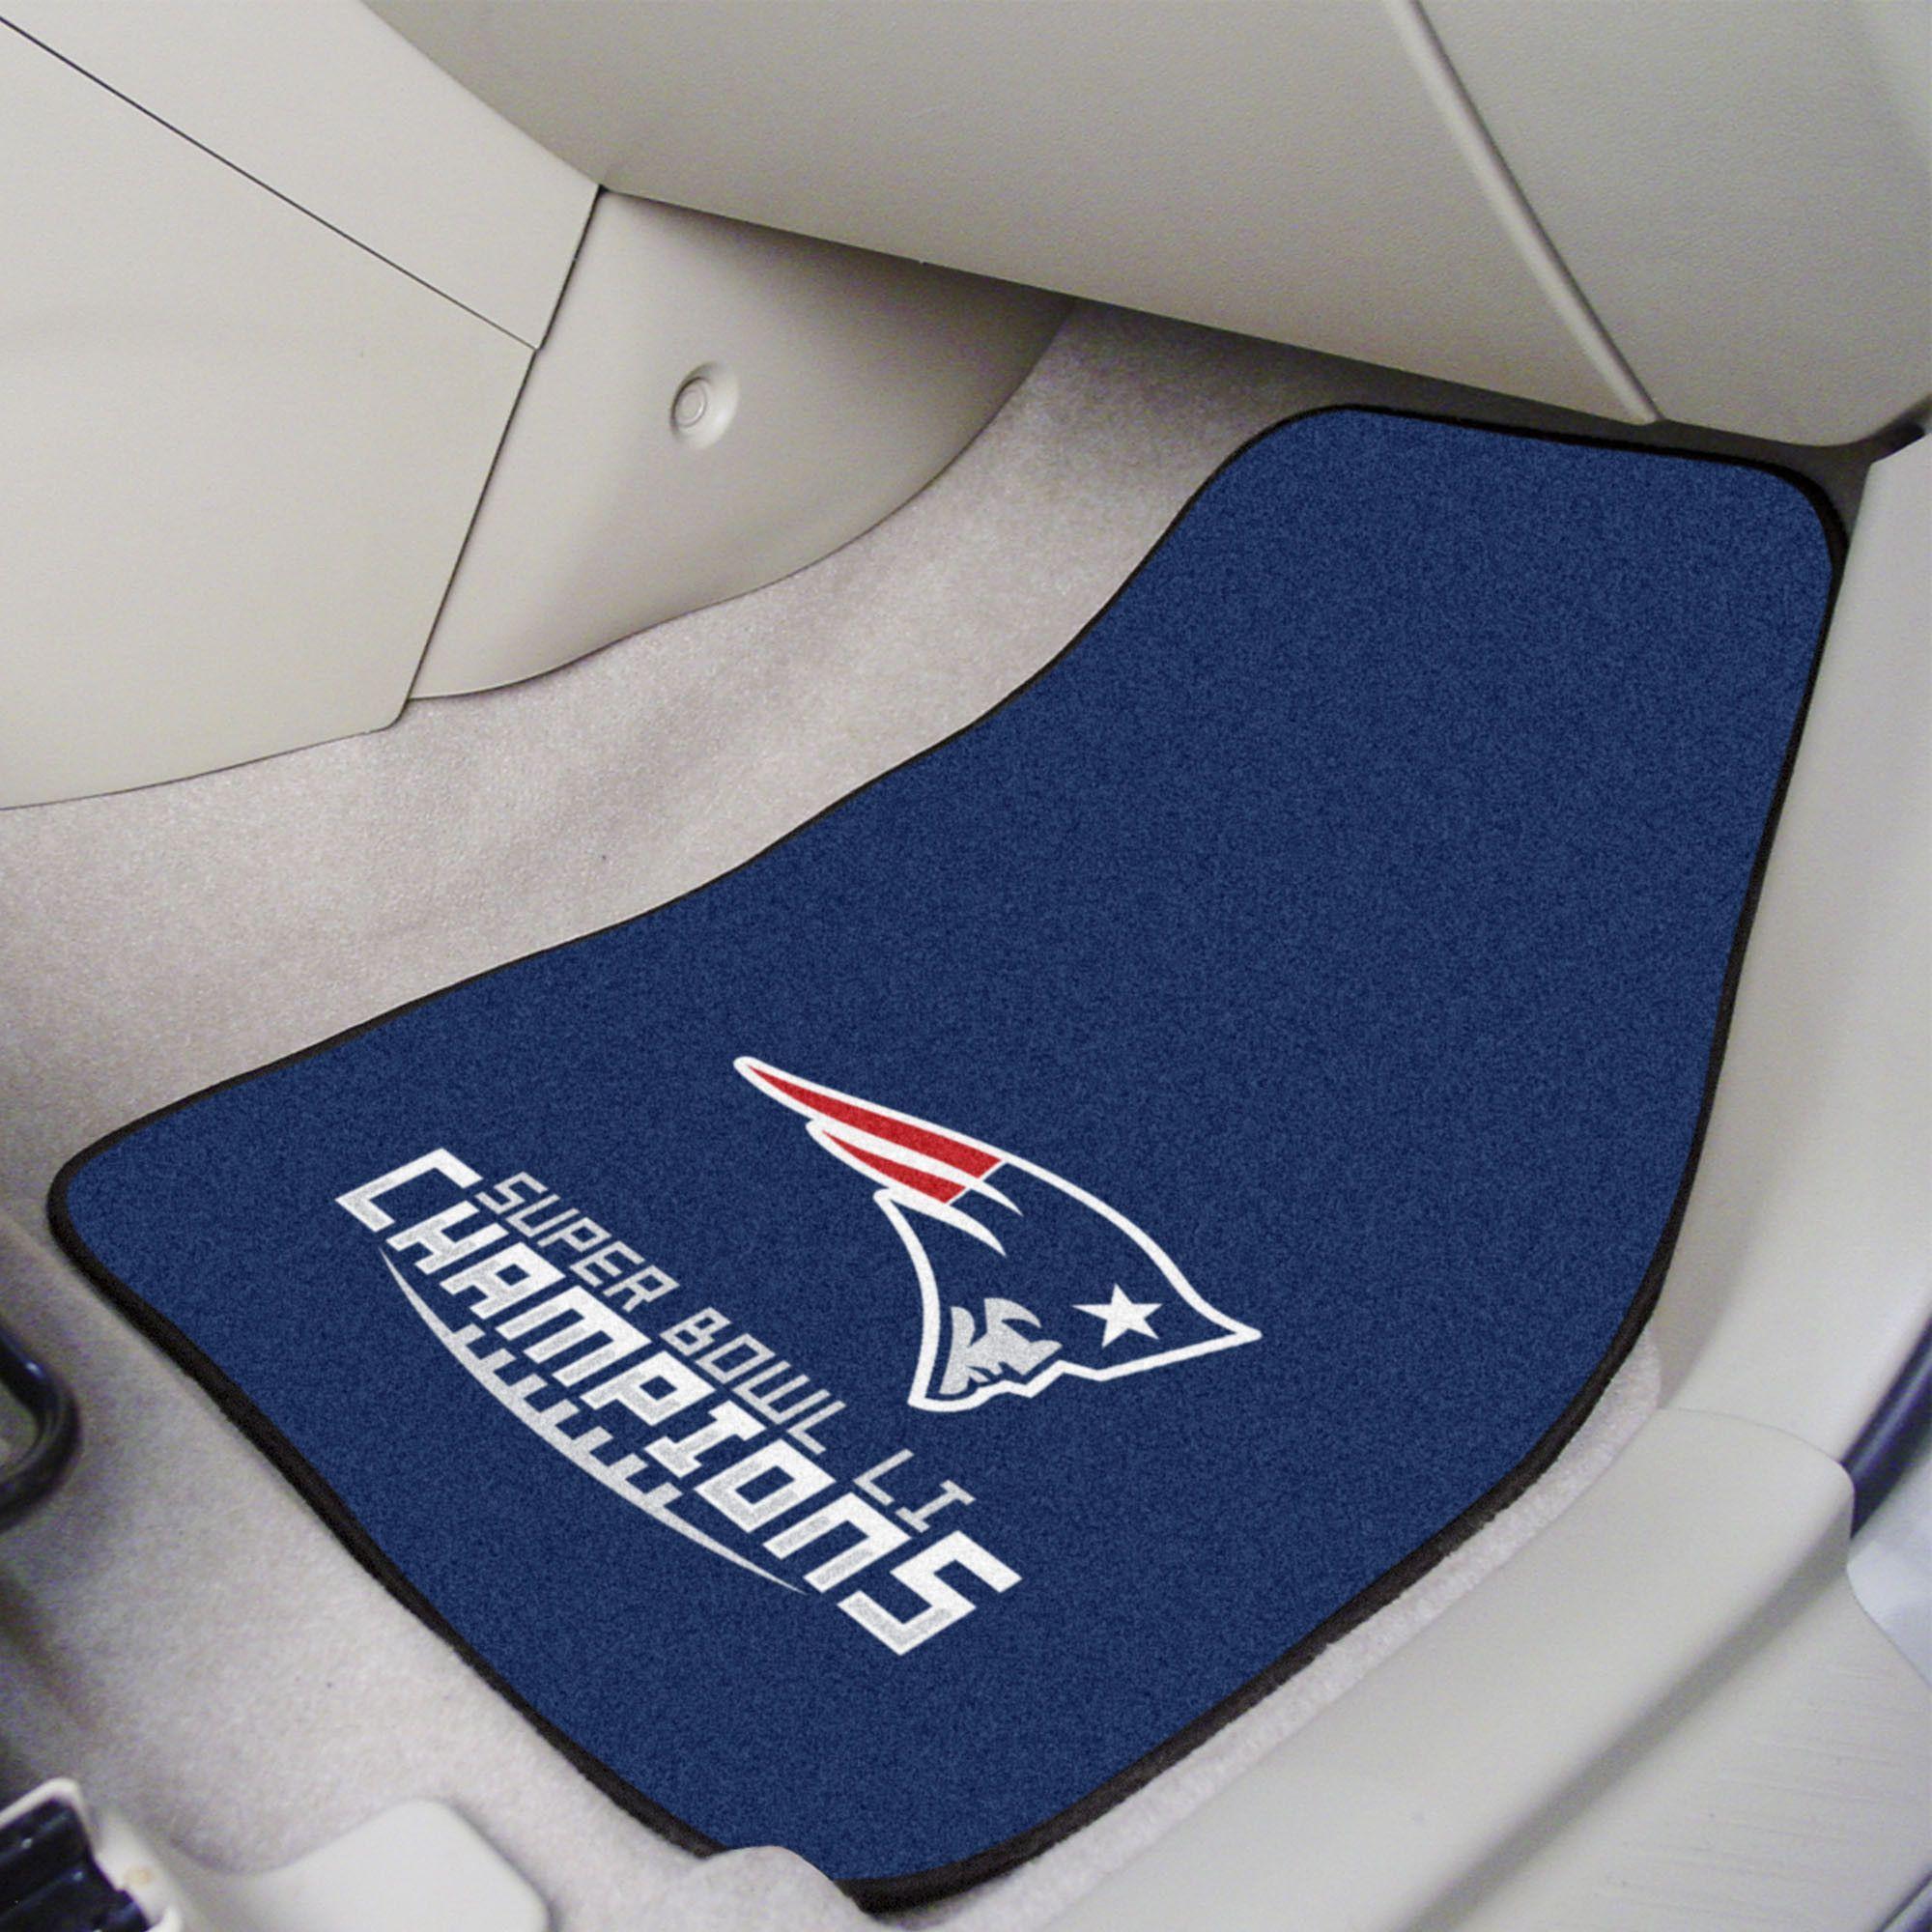 New England Patriots Super Bowl LI Champions 2 Piece Carpeted Cat Mats 18x27